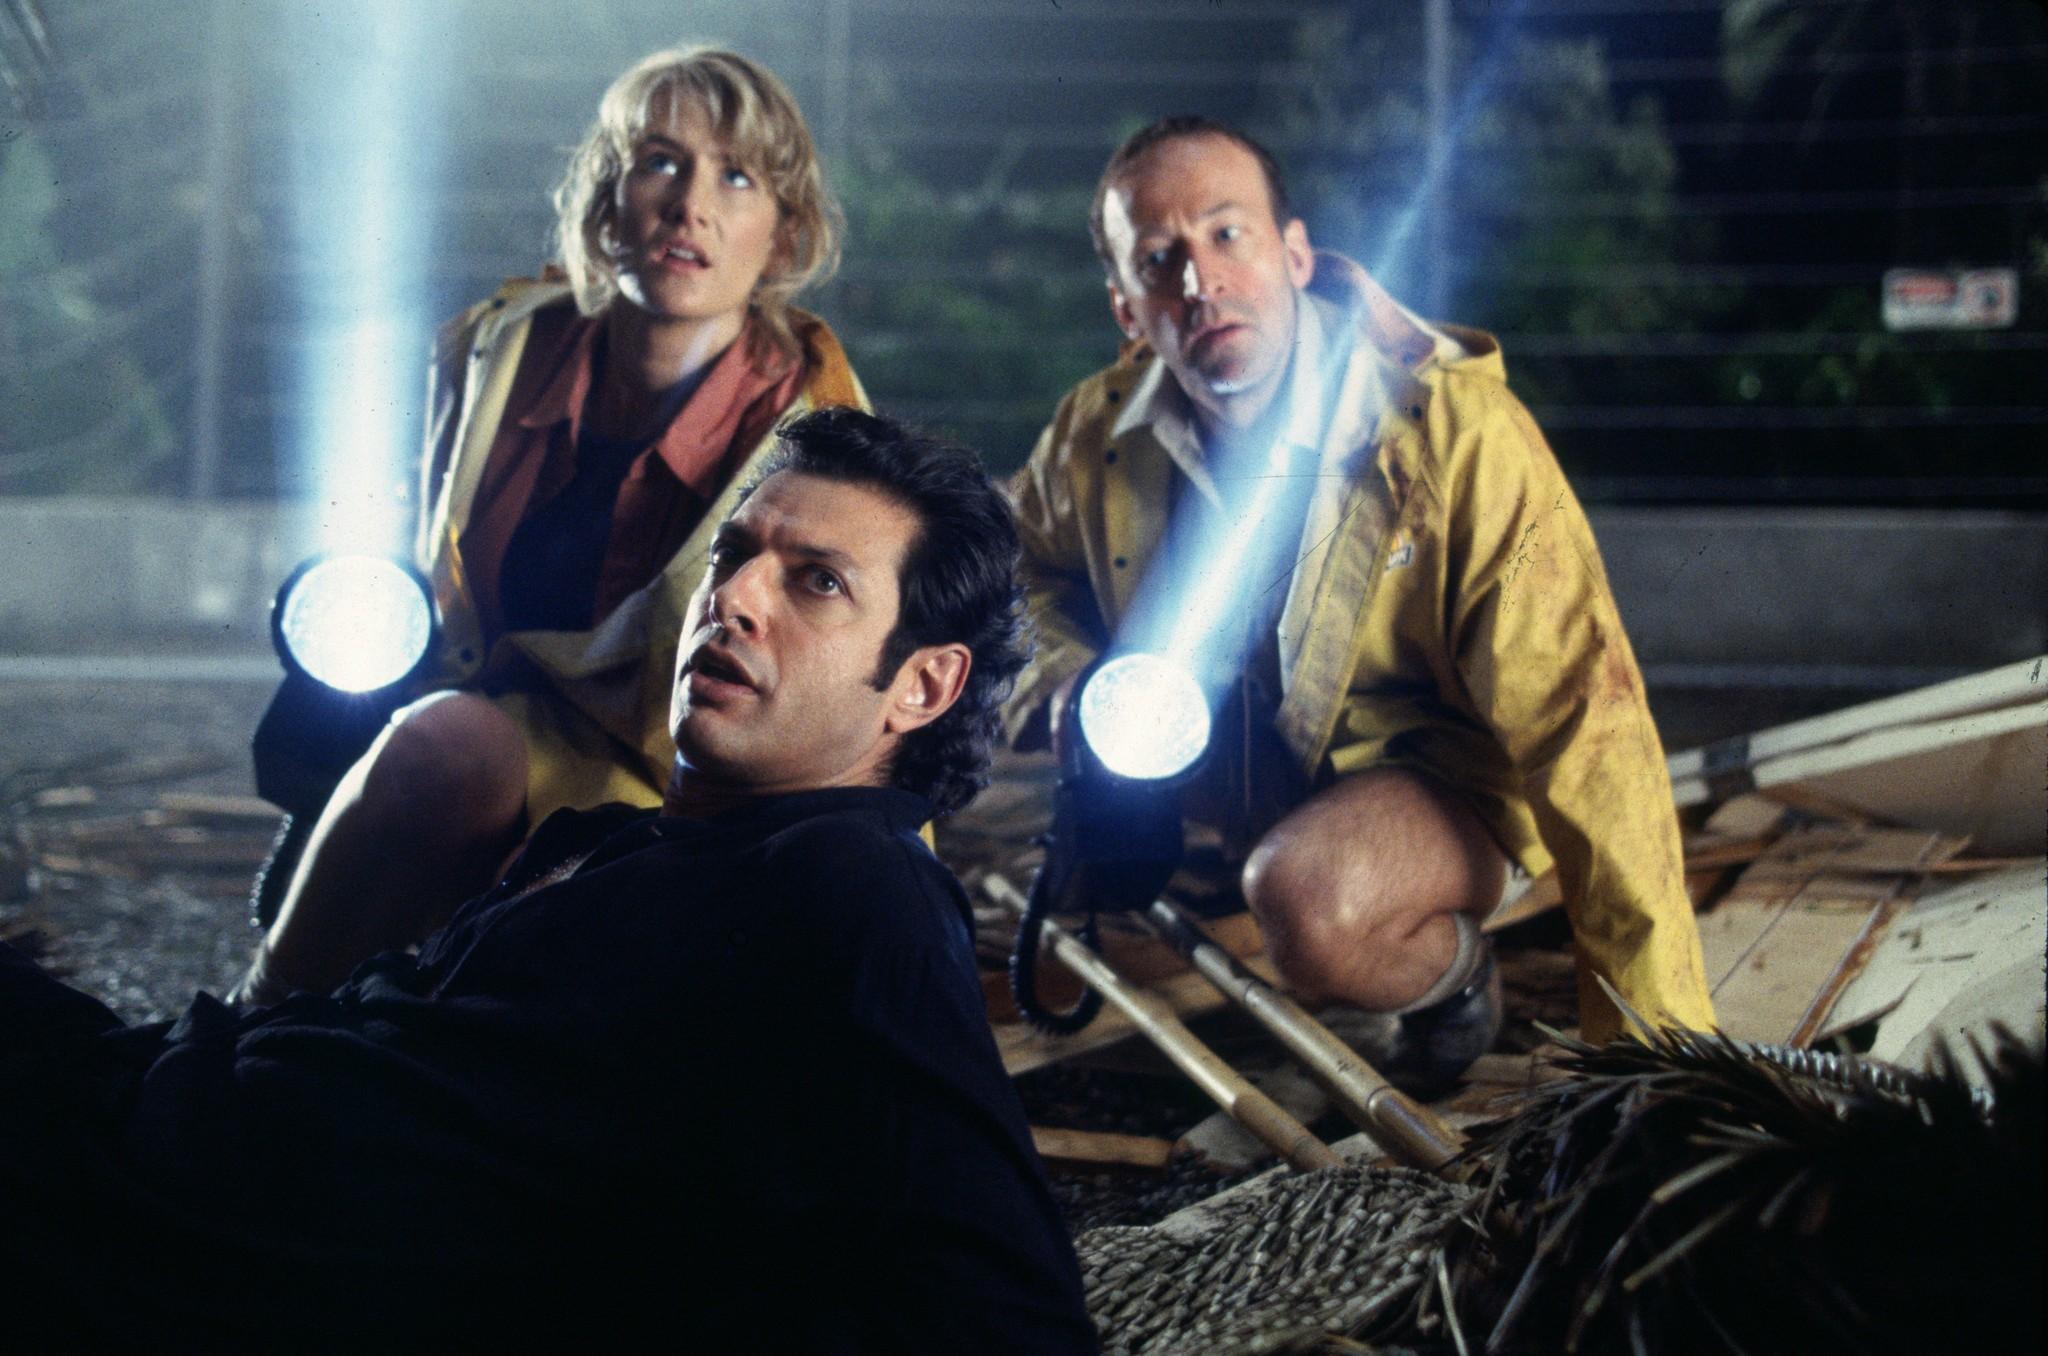 Jeff Goldblum, Laura Dern, and Bob Peck in Jurassic Park (1993)